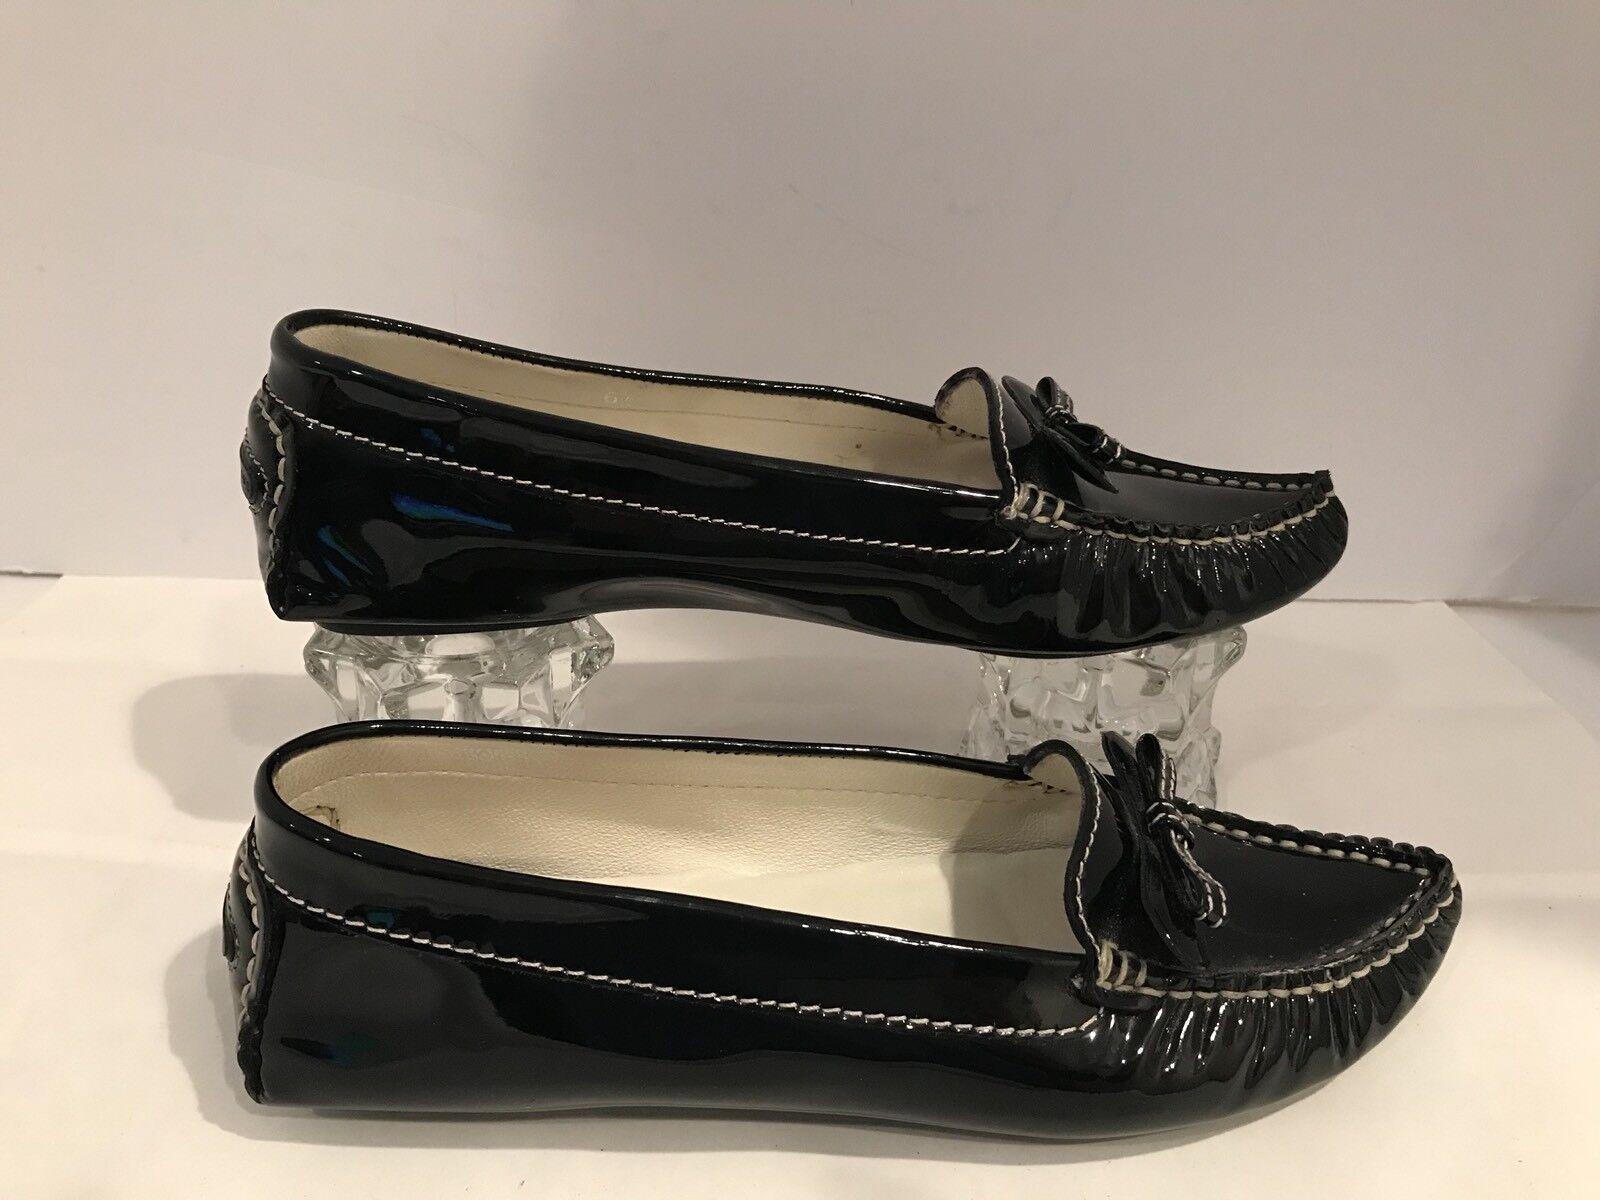 MARC JACOBS Woman Patent Size Leather Lather Point Flats Size Patent 6.5 dc11d4